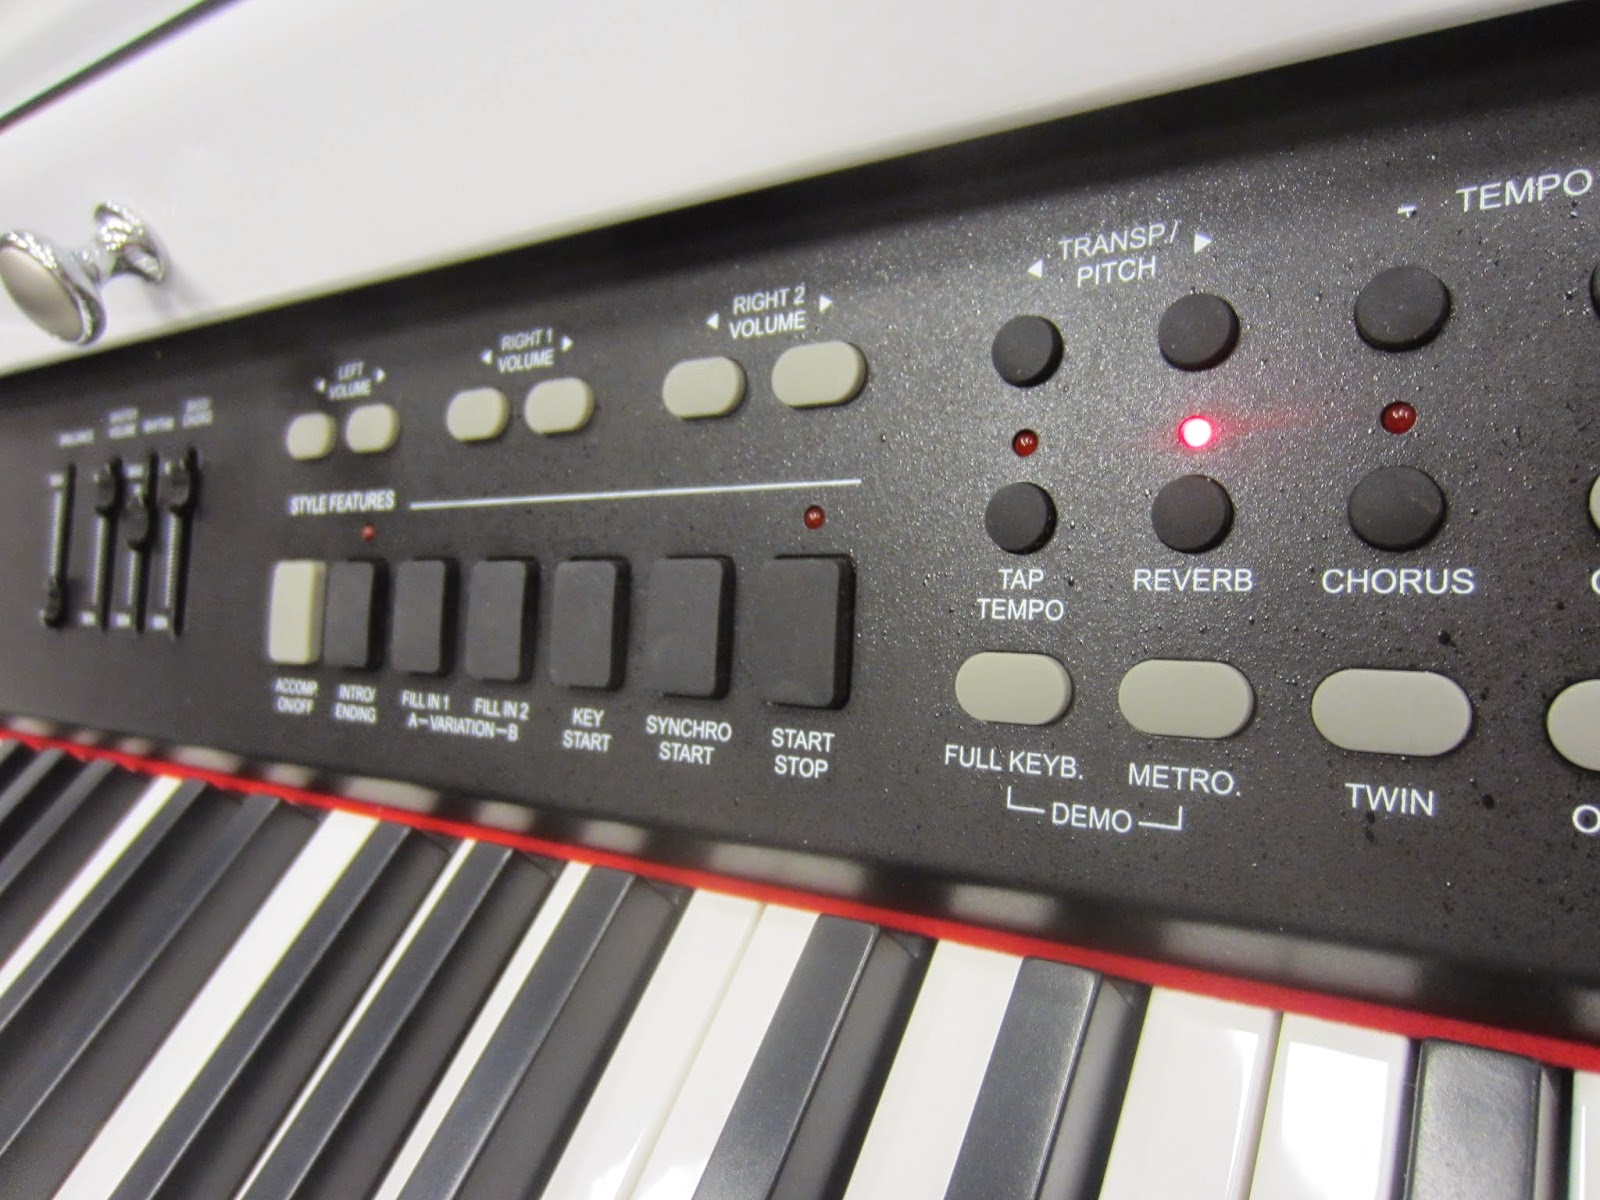 Samick SG450 digital piano